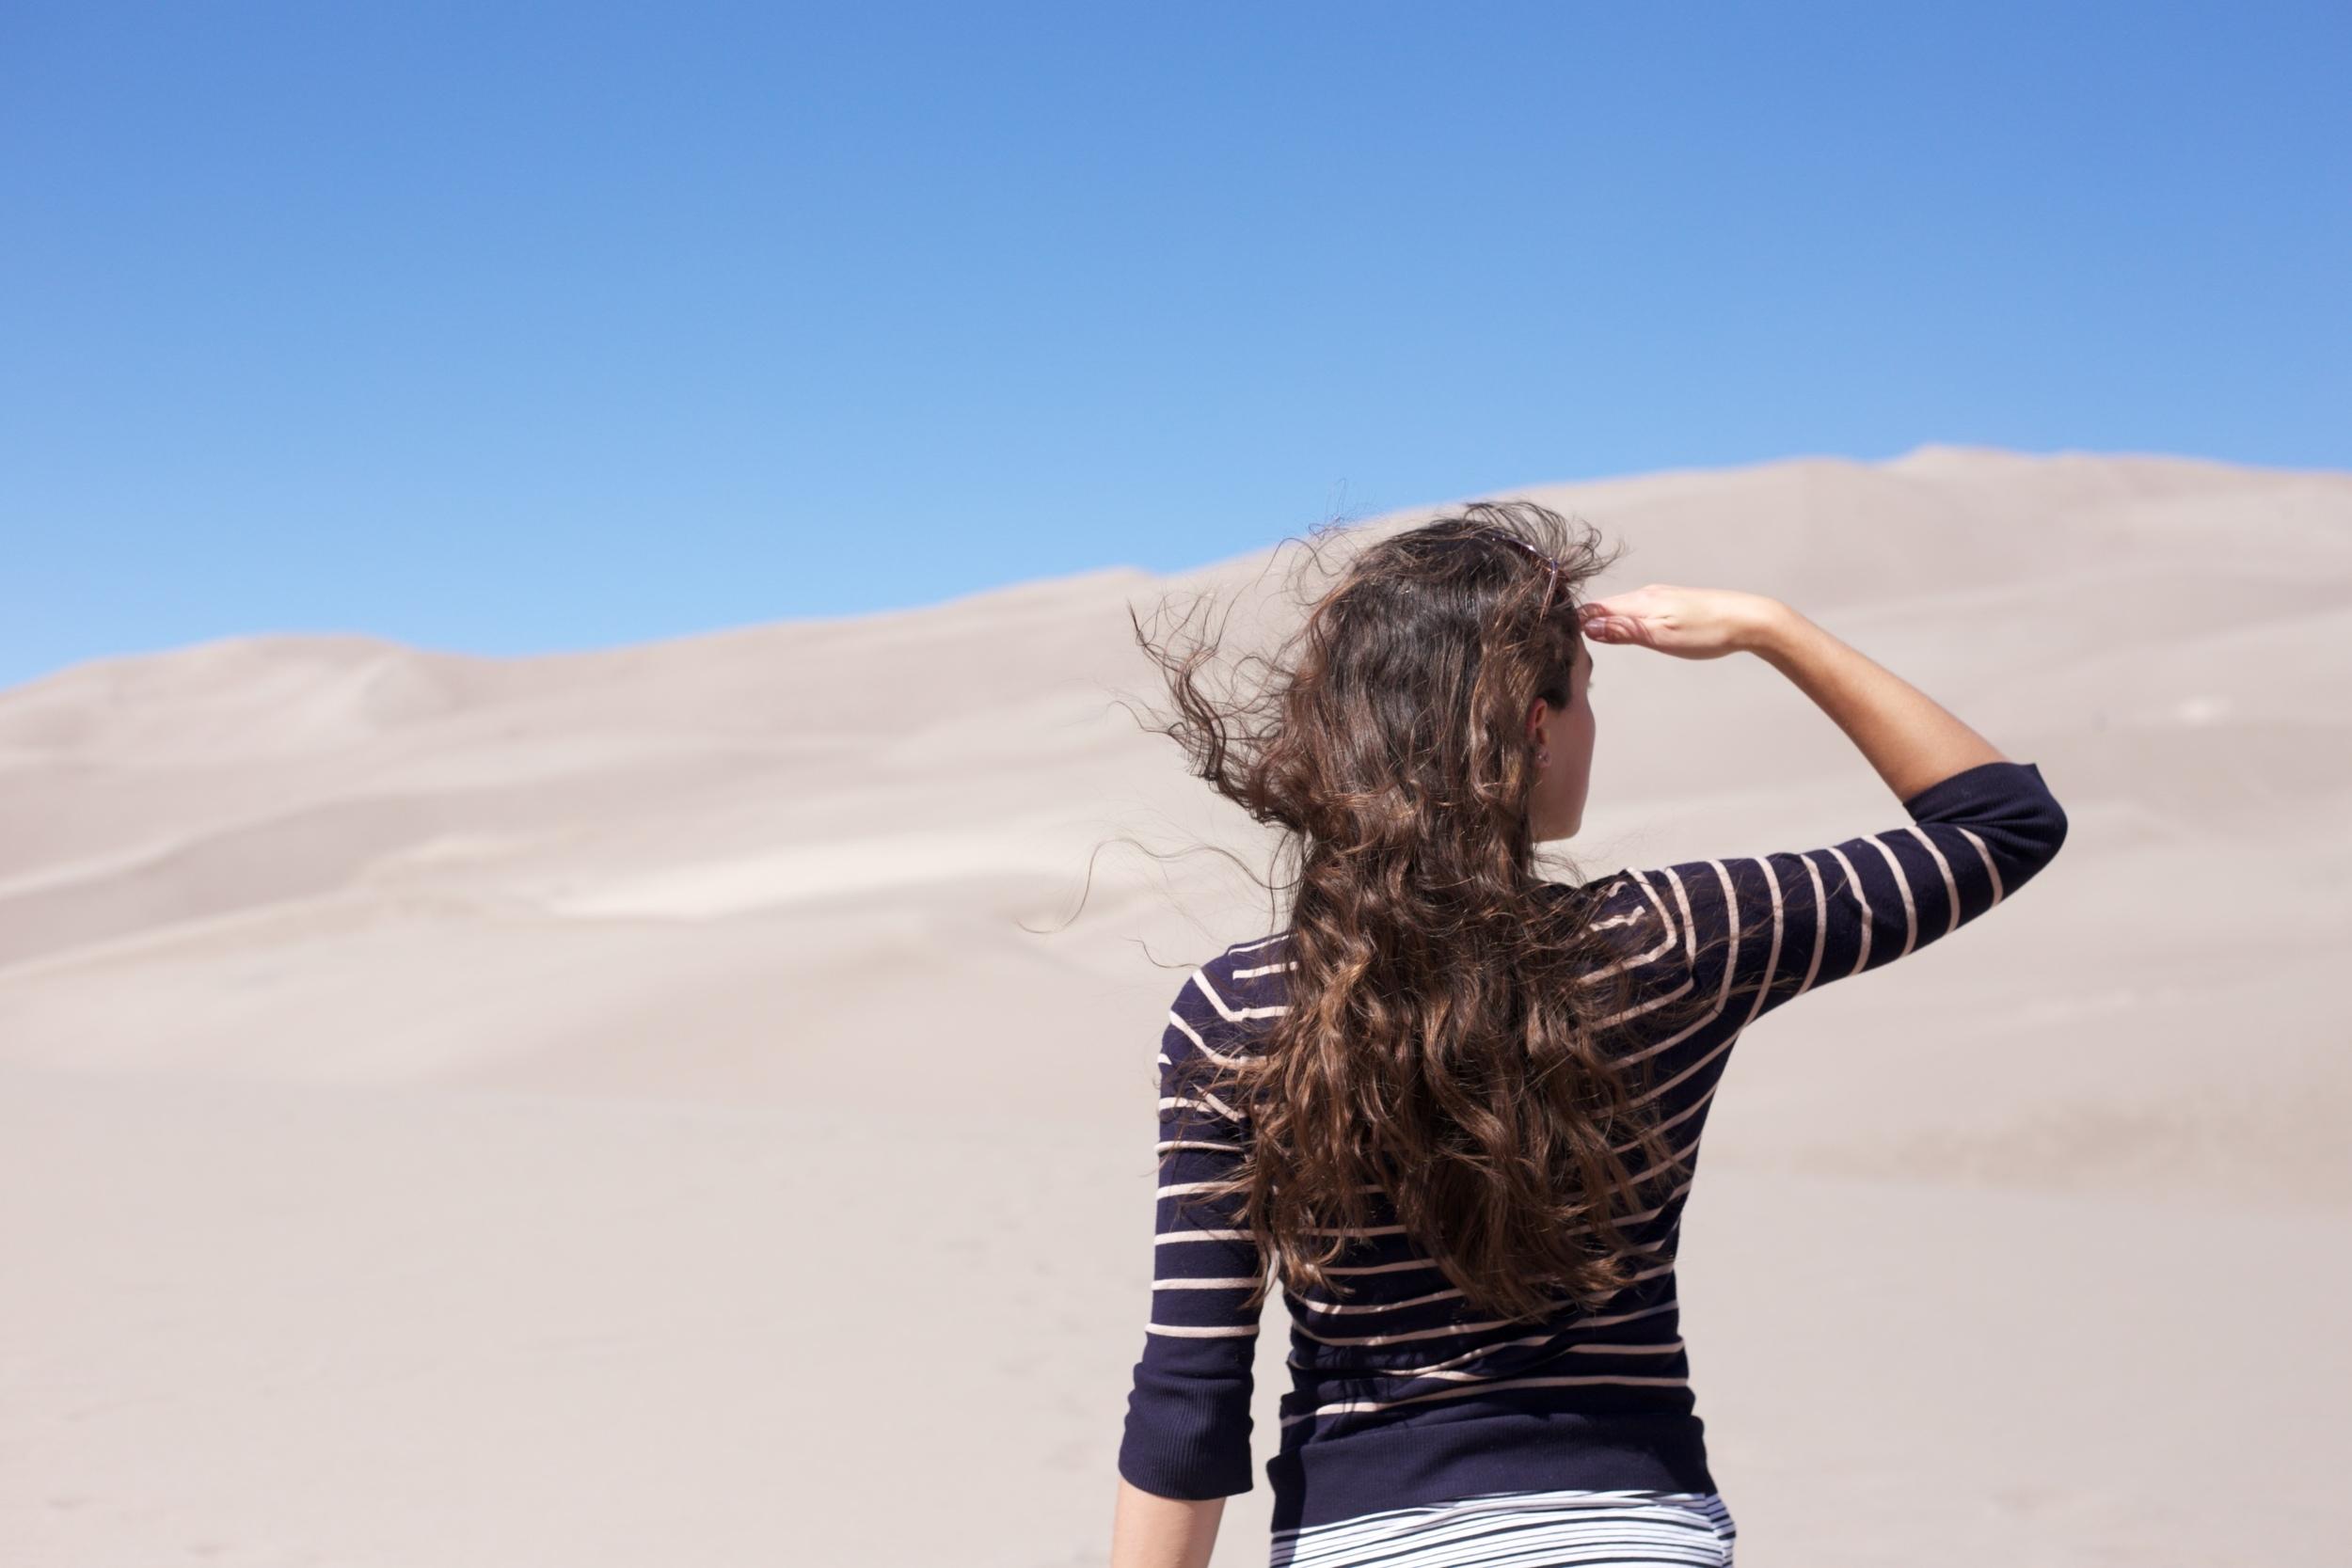 Surveying the sand dunes, Colorado.